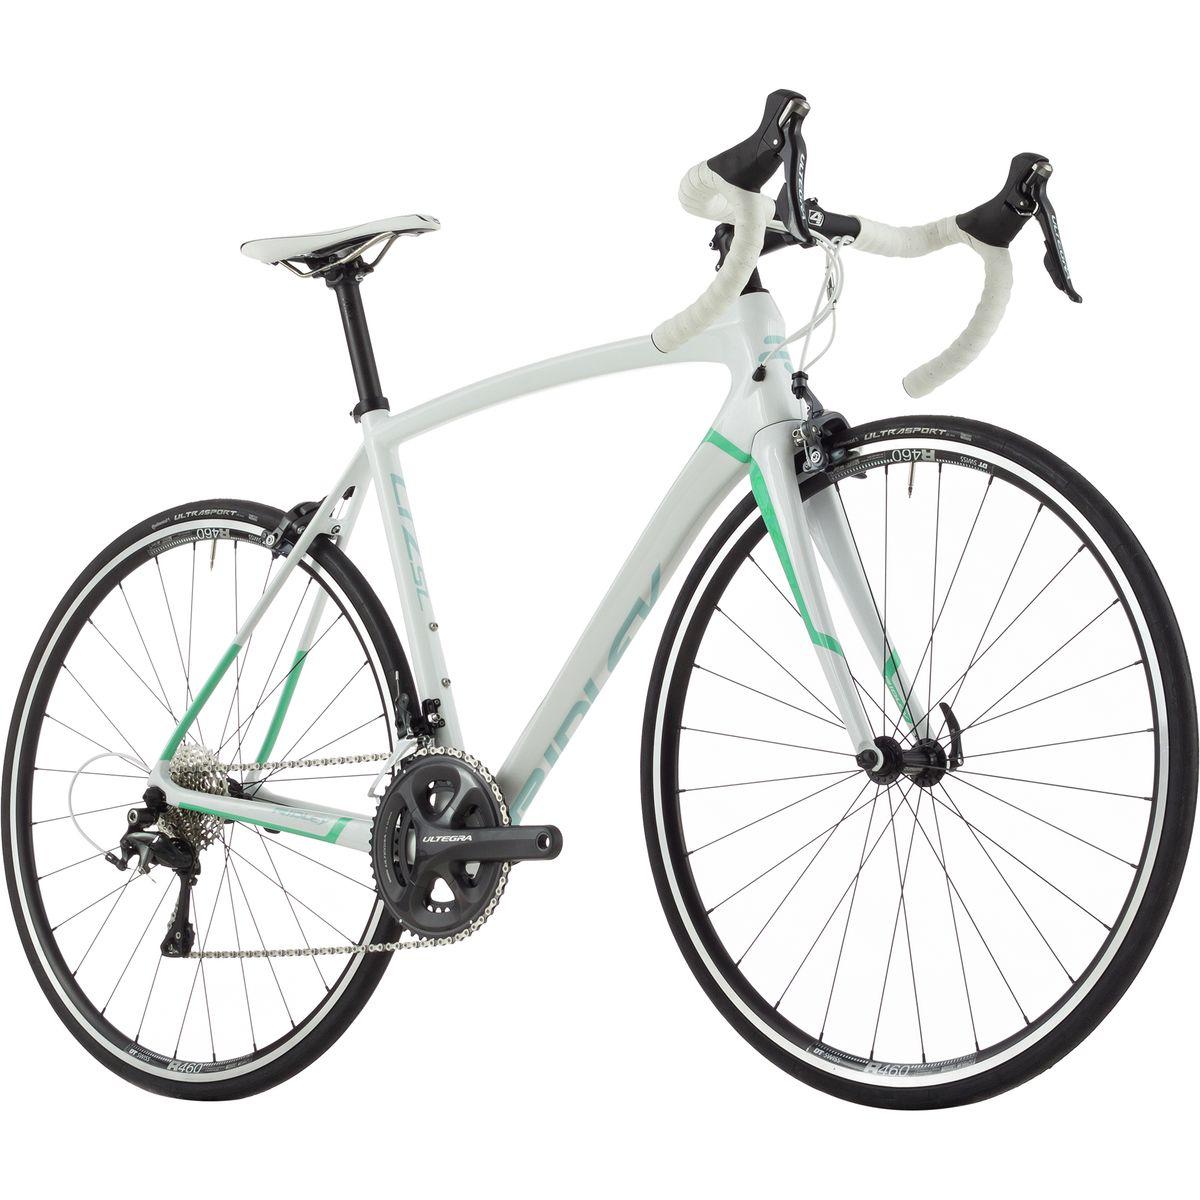 Ridley Liz Sl Ultegra Complete Road Bike 2017 Competitive Cyclist